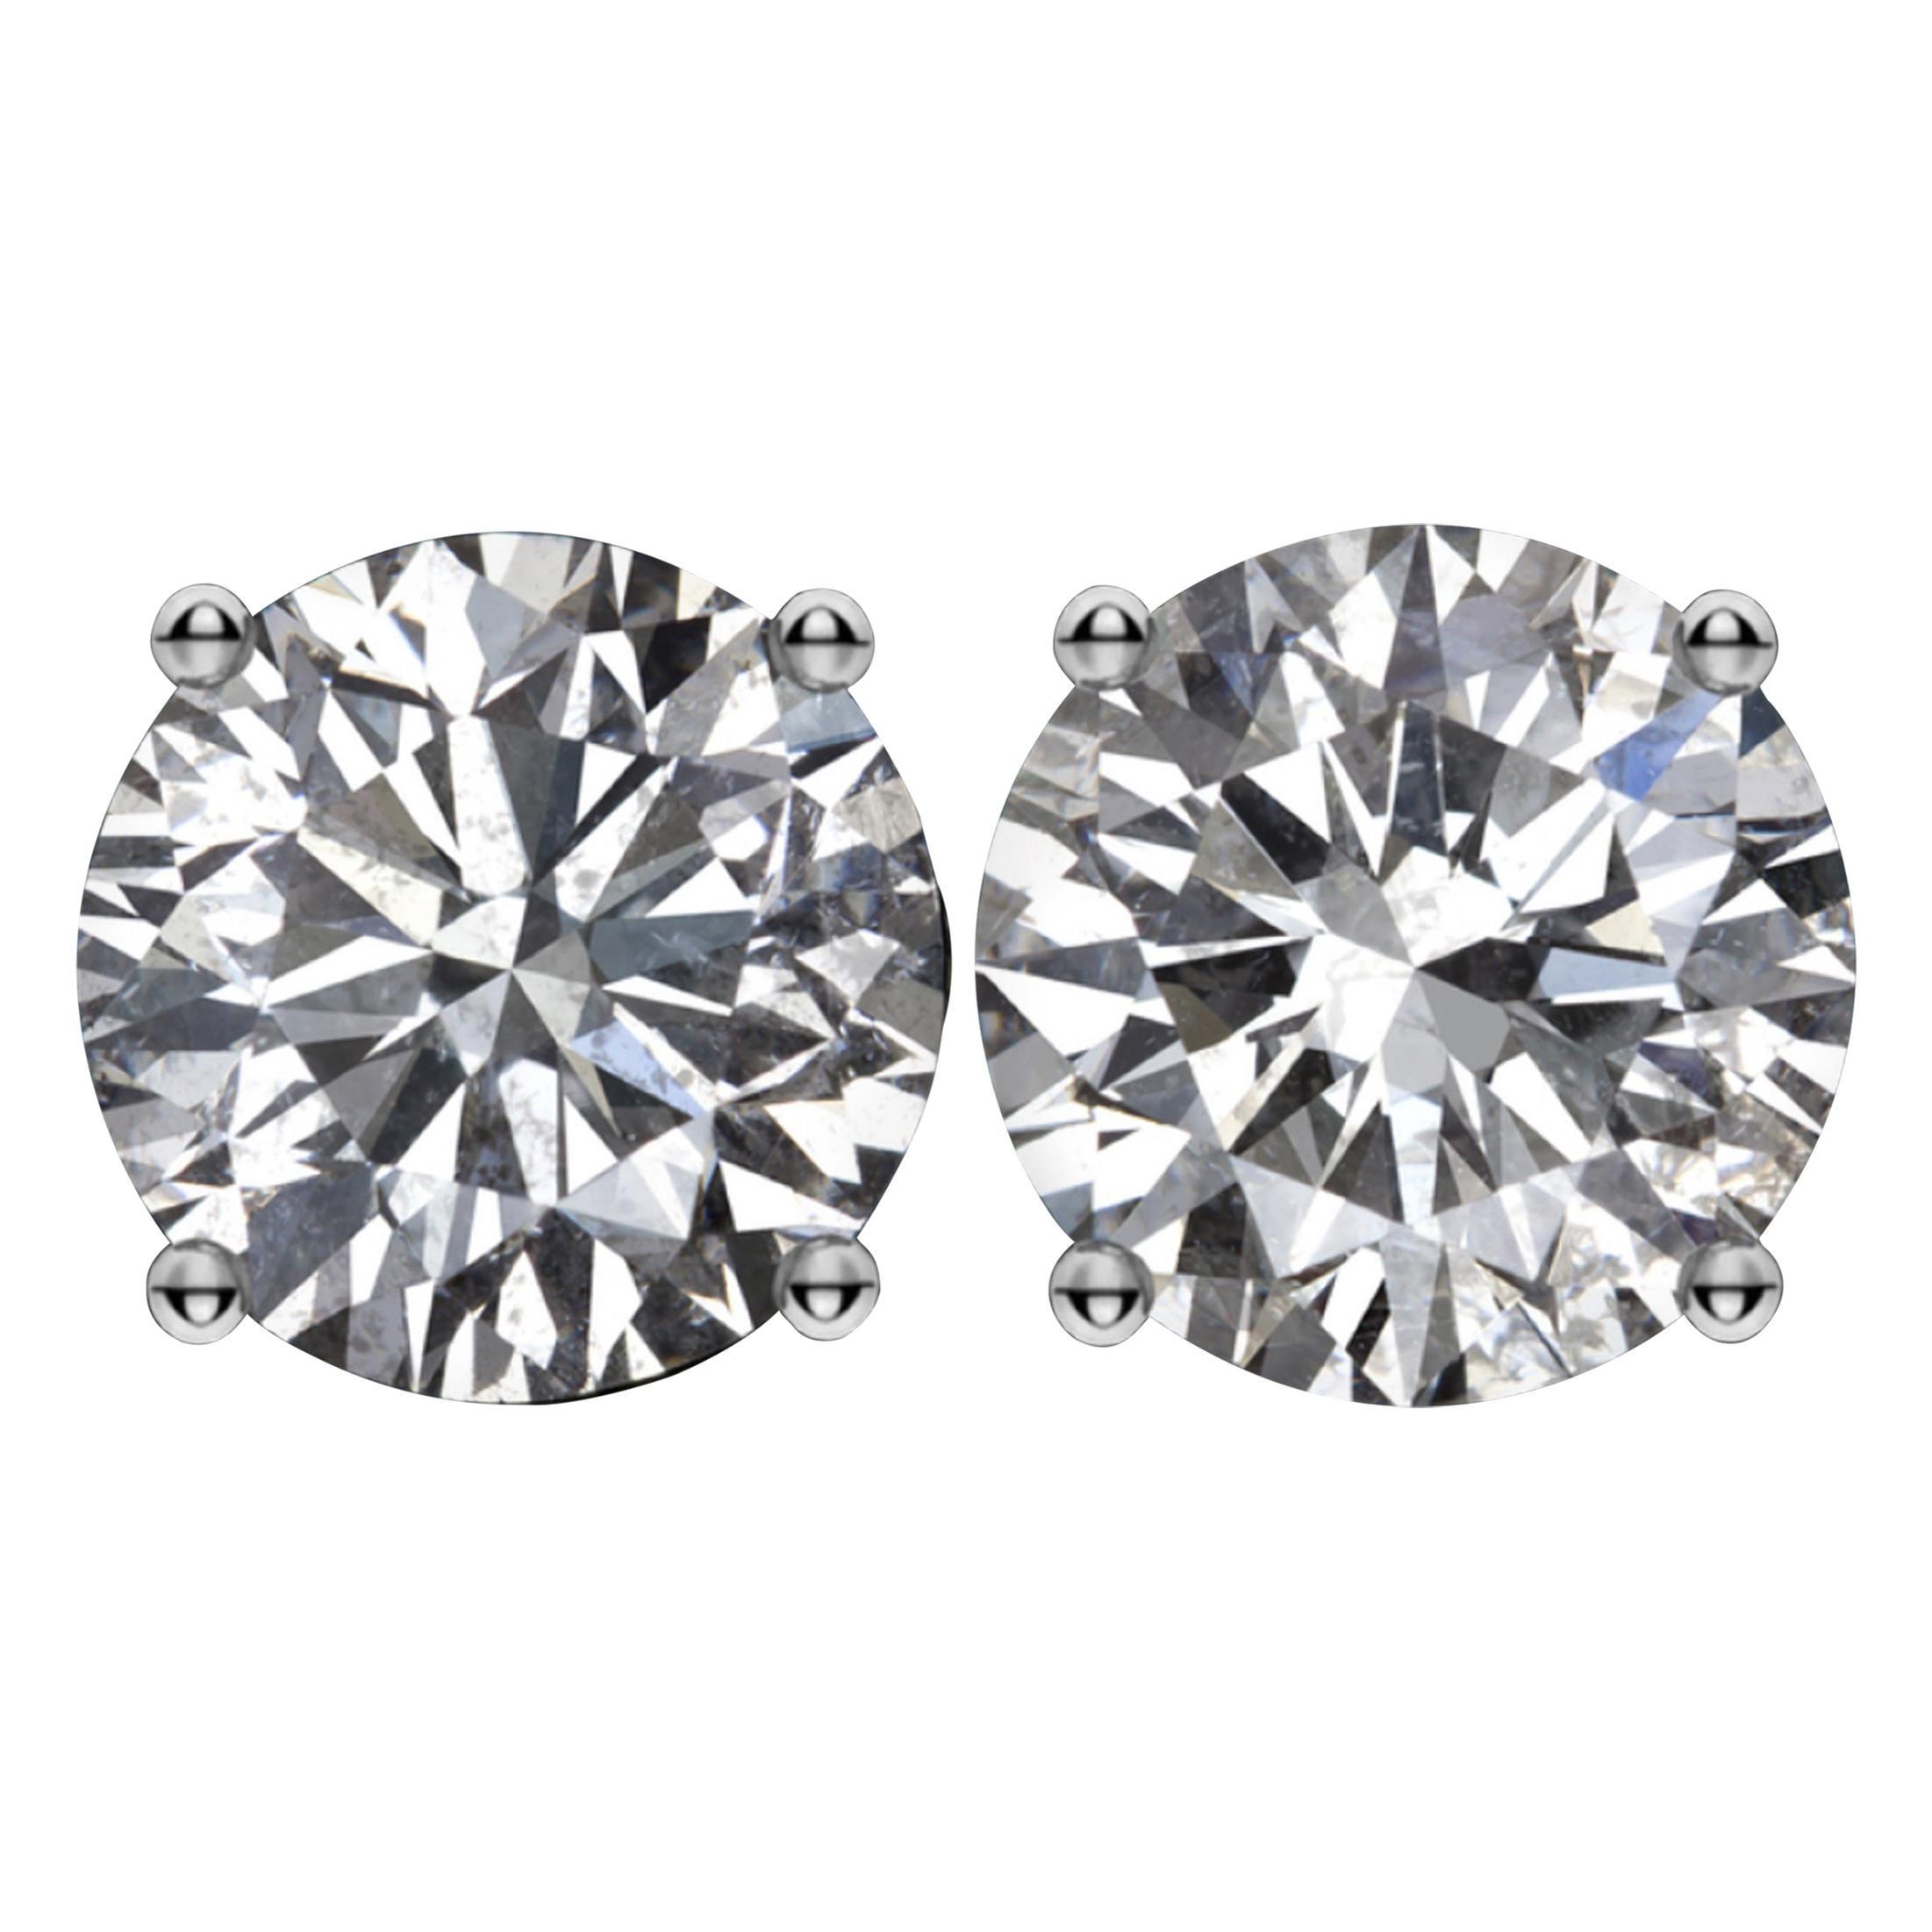 GIA Certified 3.01 Carat Round Brilliant Cut Diamond Studs